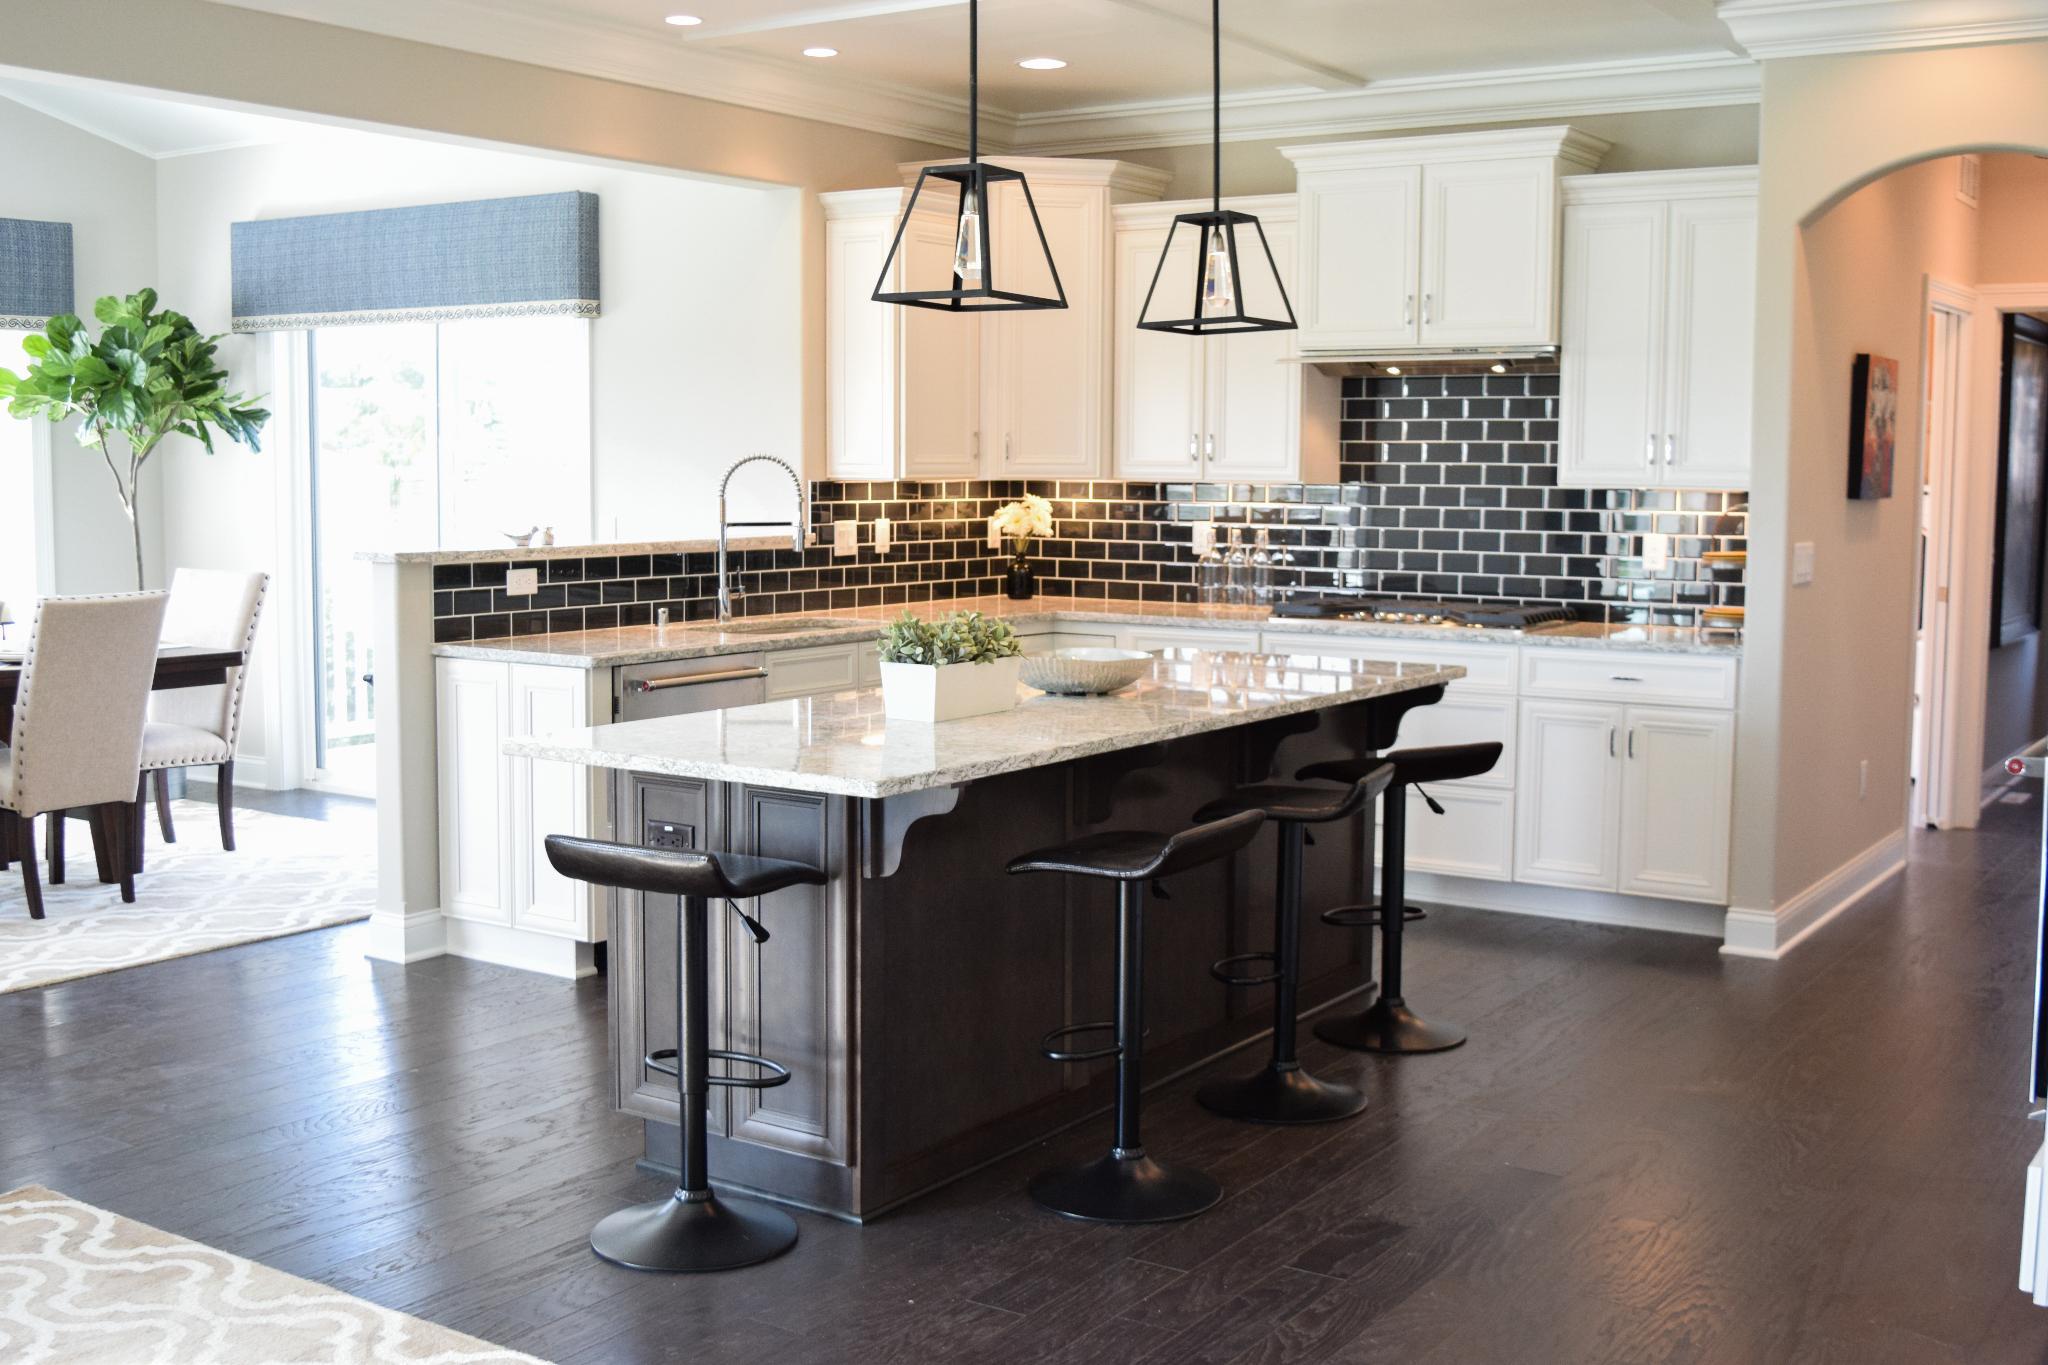 Design Studio | Korndoerfer Homes on design homes missouri, design homes mo, design homes oregon, design homes nebraska, design homes in mn,